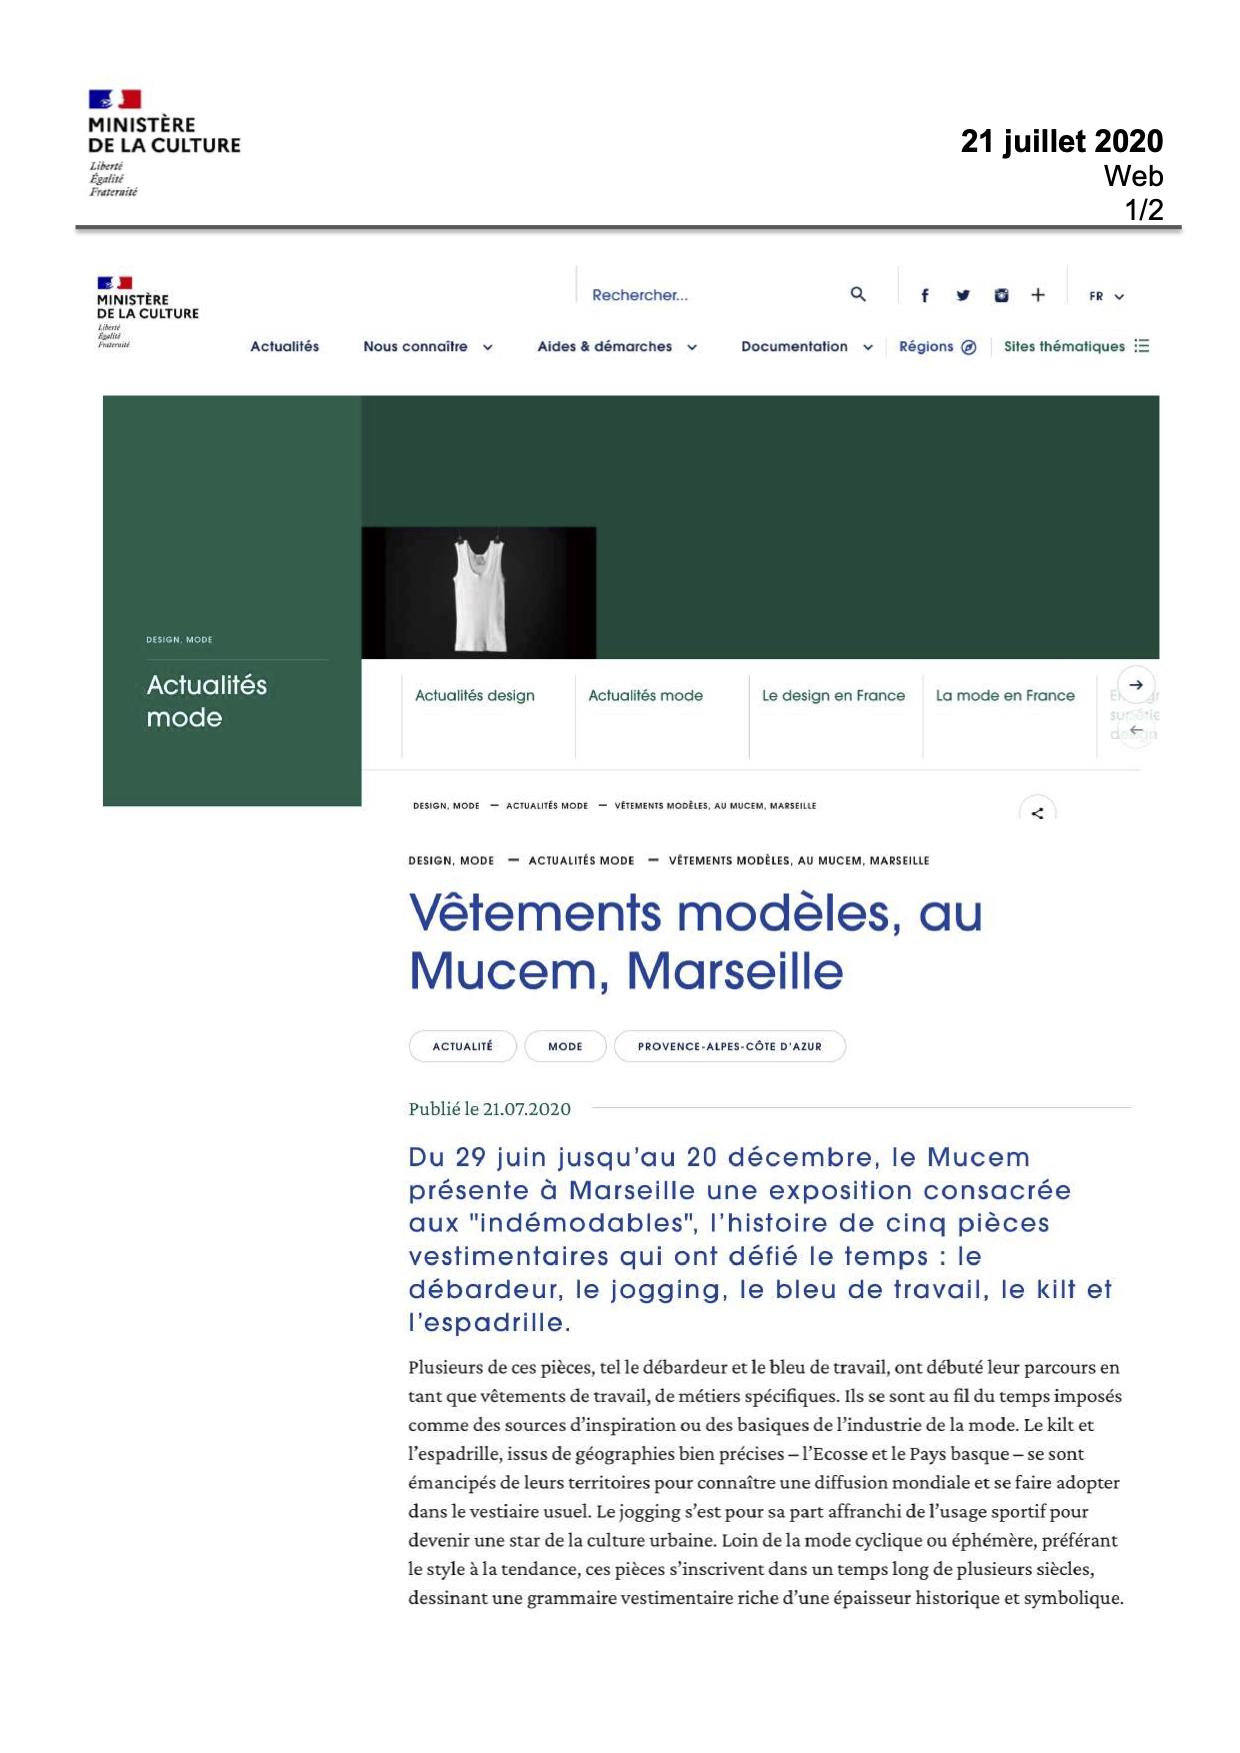 Culture.gouv.fr 1